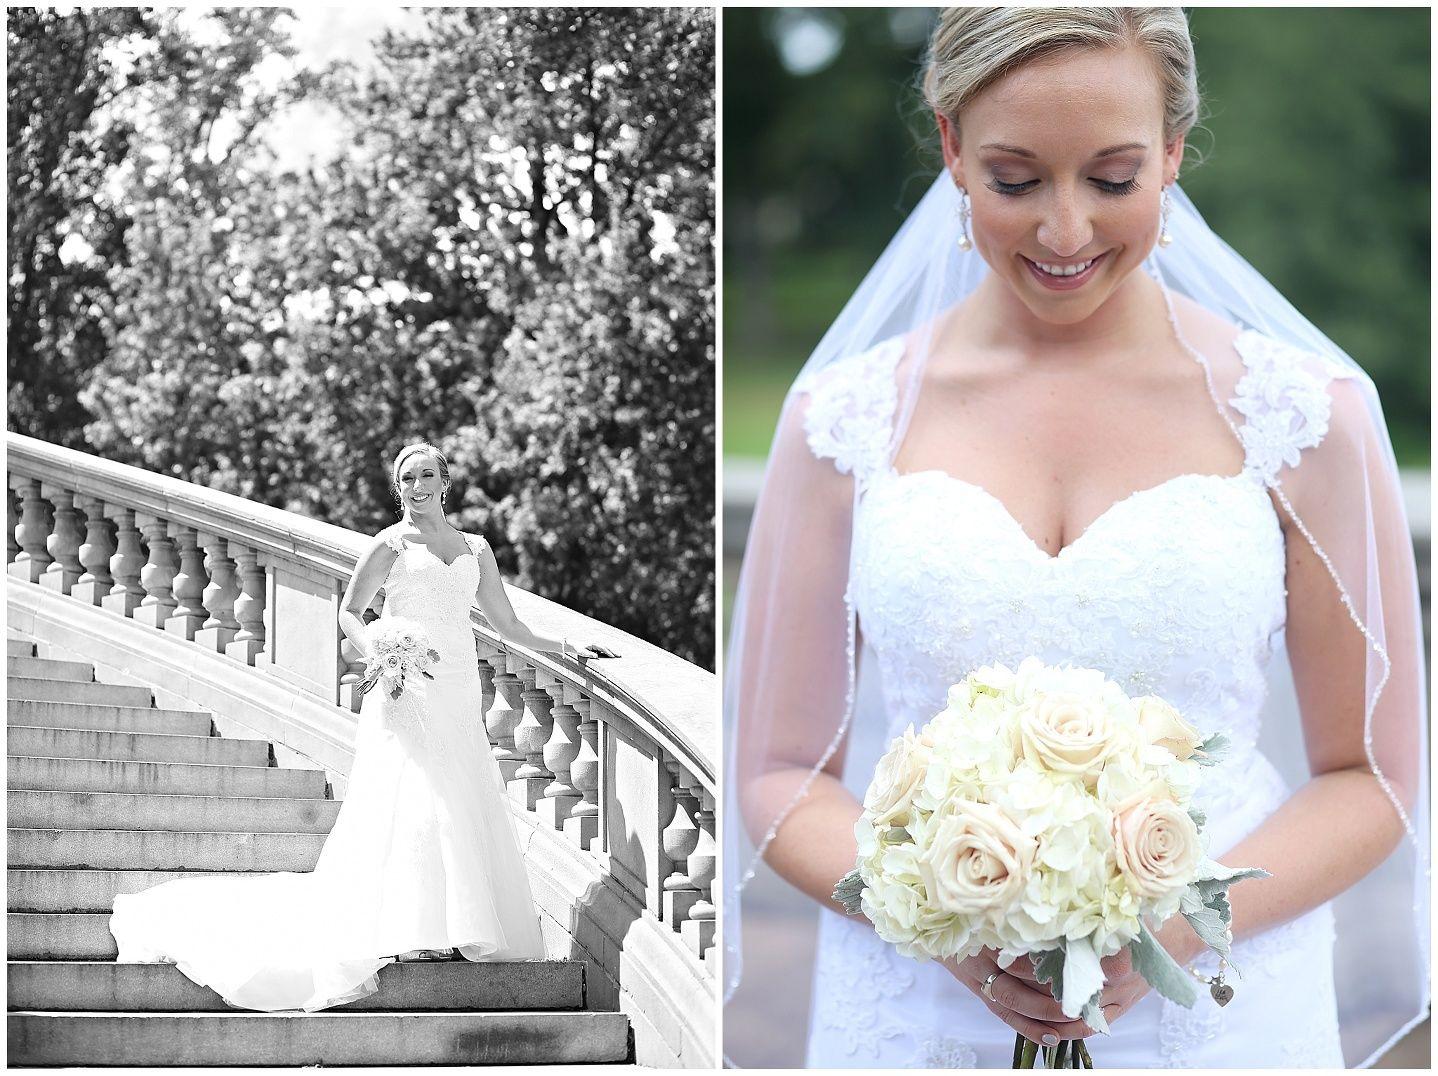 Wedding dresses richmond va  aclassicbridalsessionatthecarillonrichmondvaphotosby